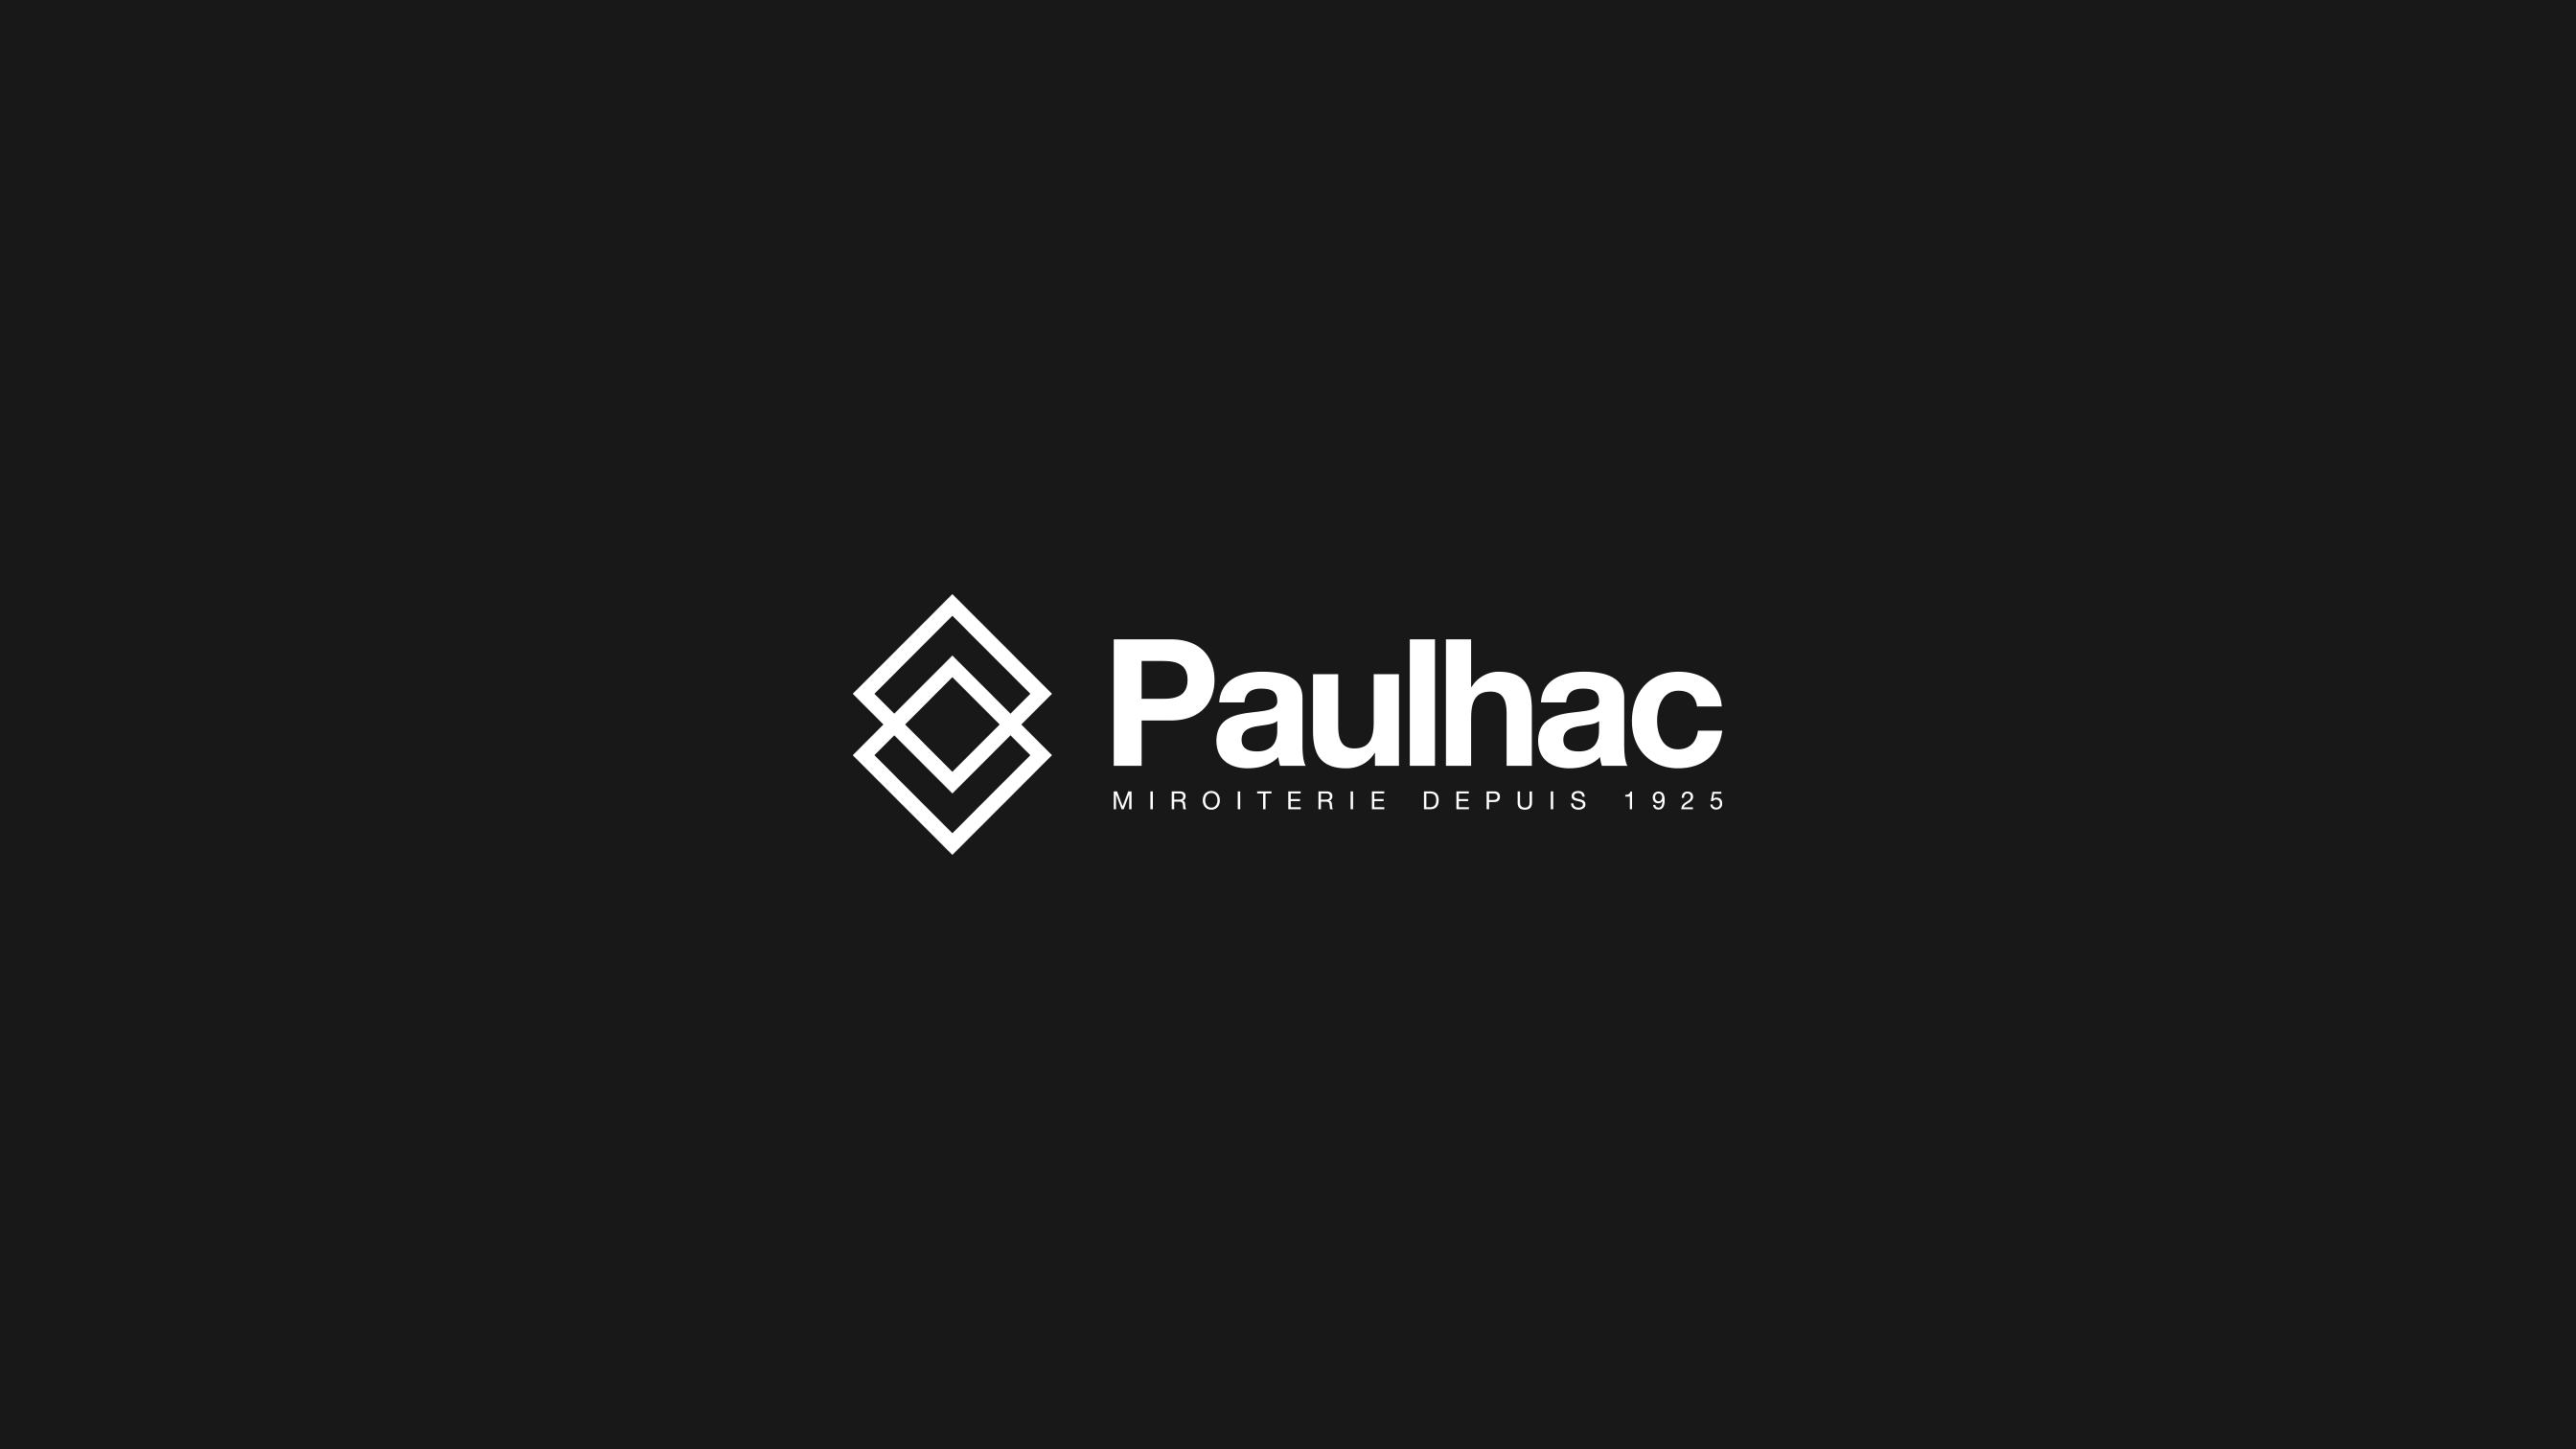 showcase-logotype-paulhac